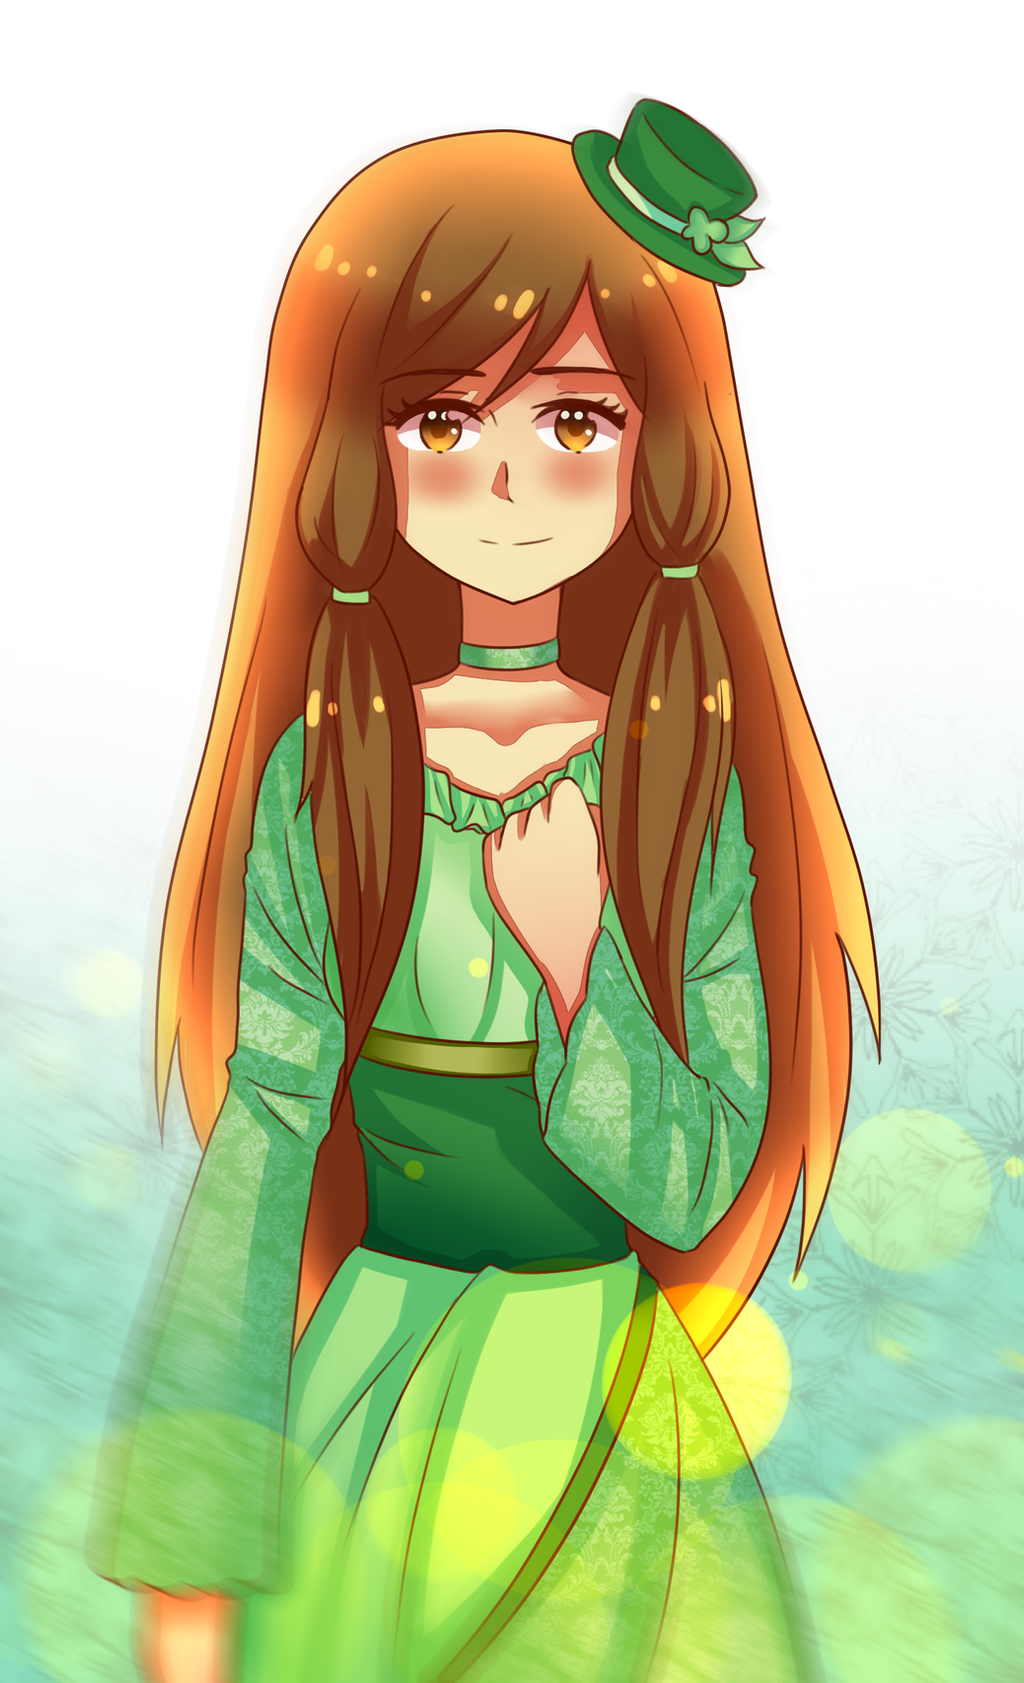 Aurora Smile by SebaDeya-chan